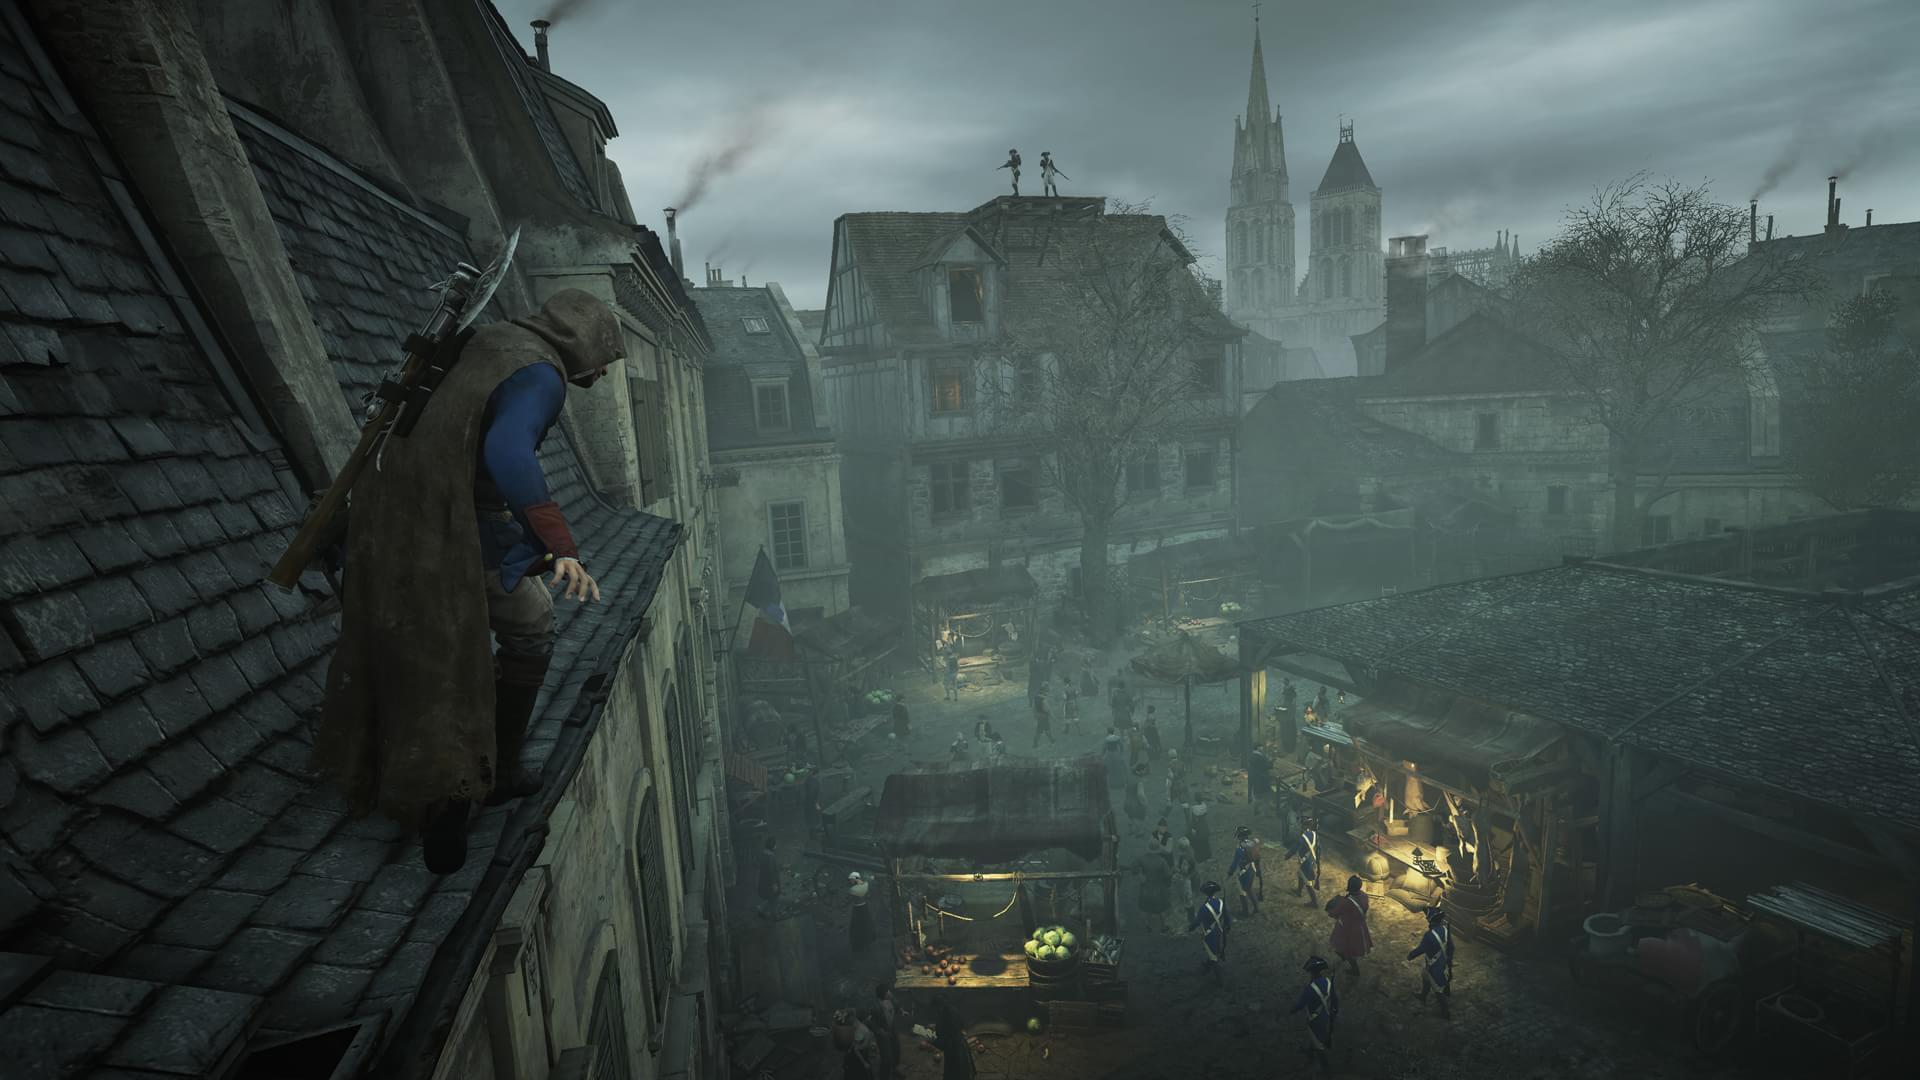 Gratuito, DLC Dead Kings para Assassin's Creed Unity sai na próxima semana